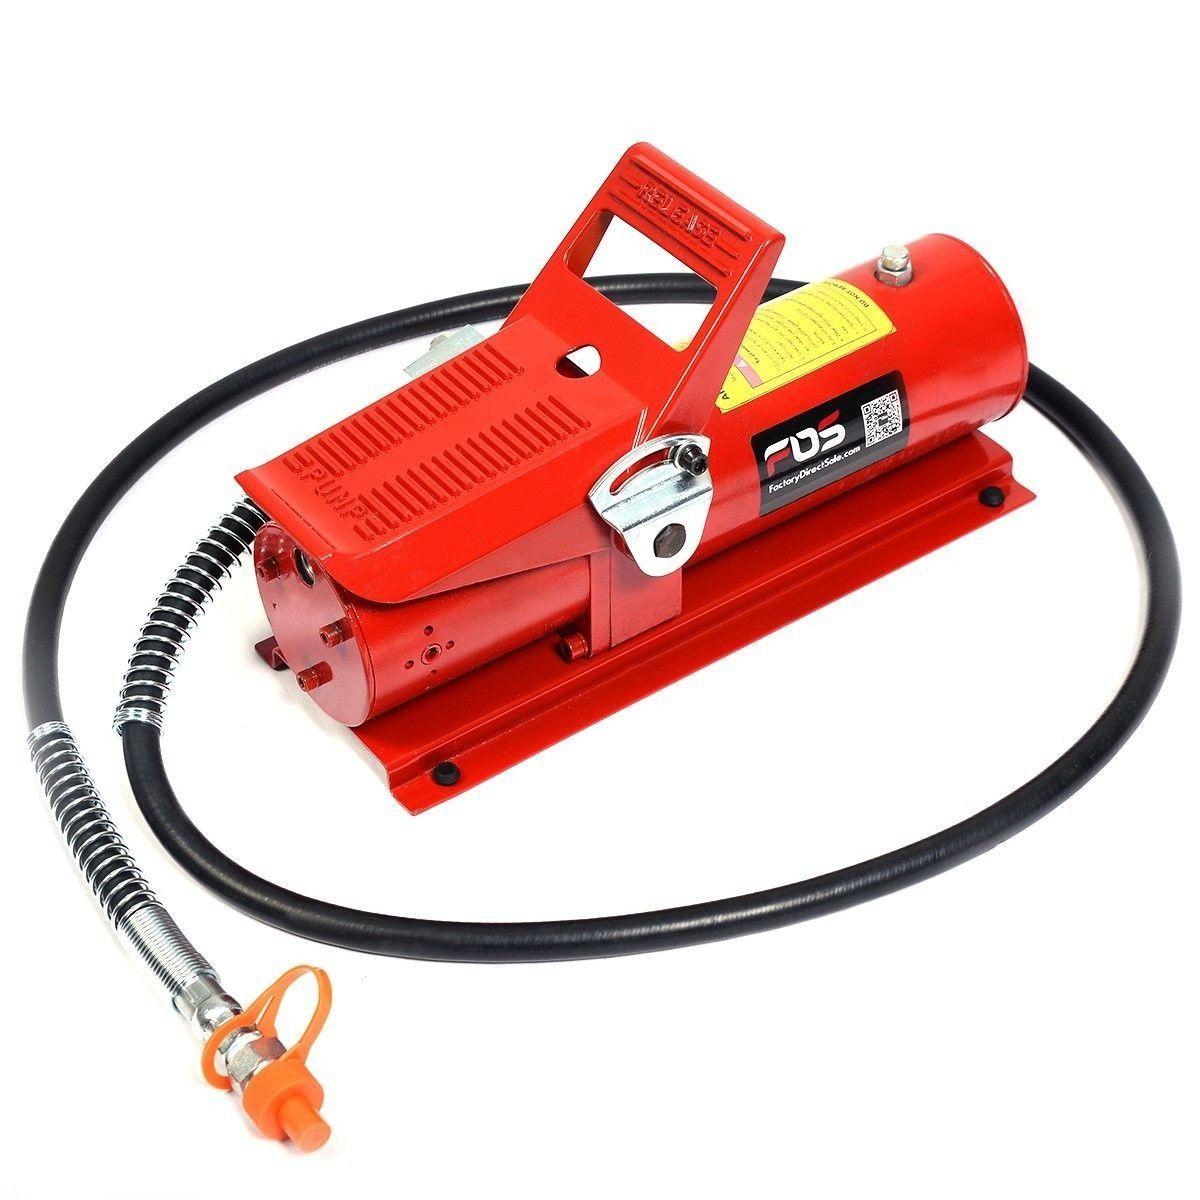 10 Ton Porta Power Hydraulic Air Foot Pump Control Lift